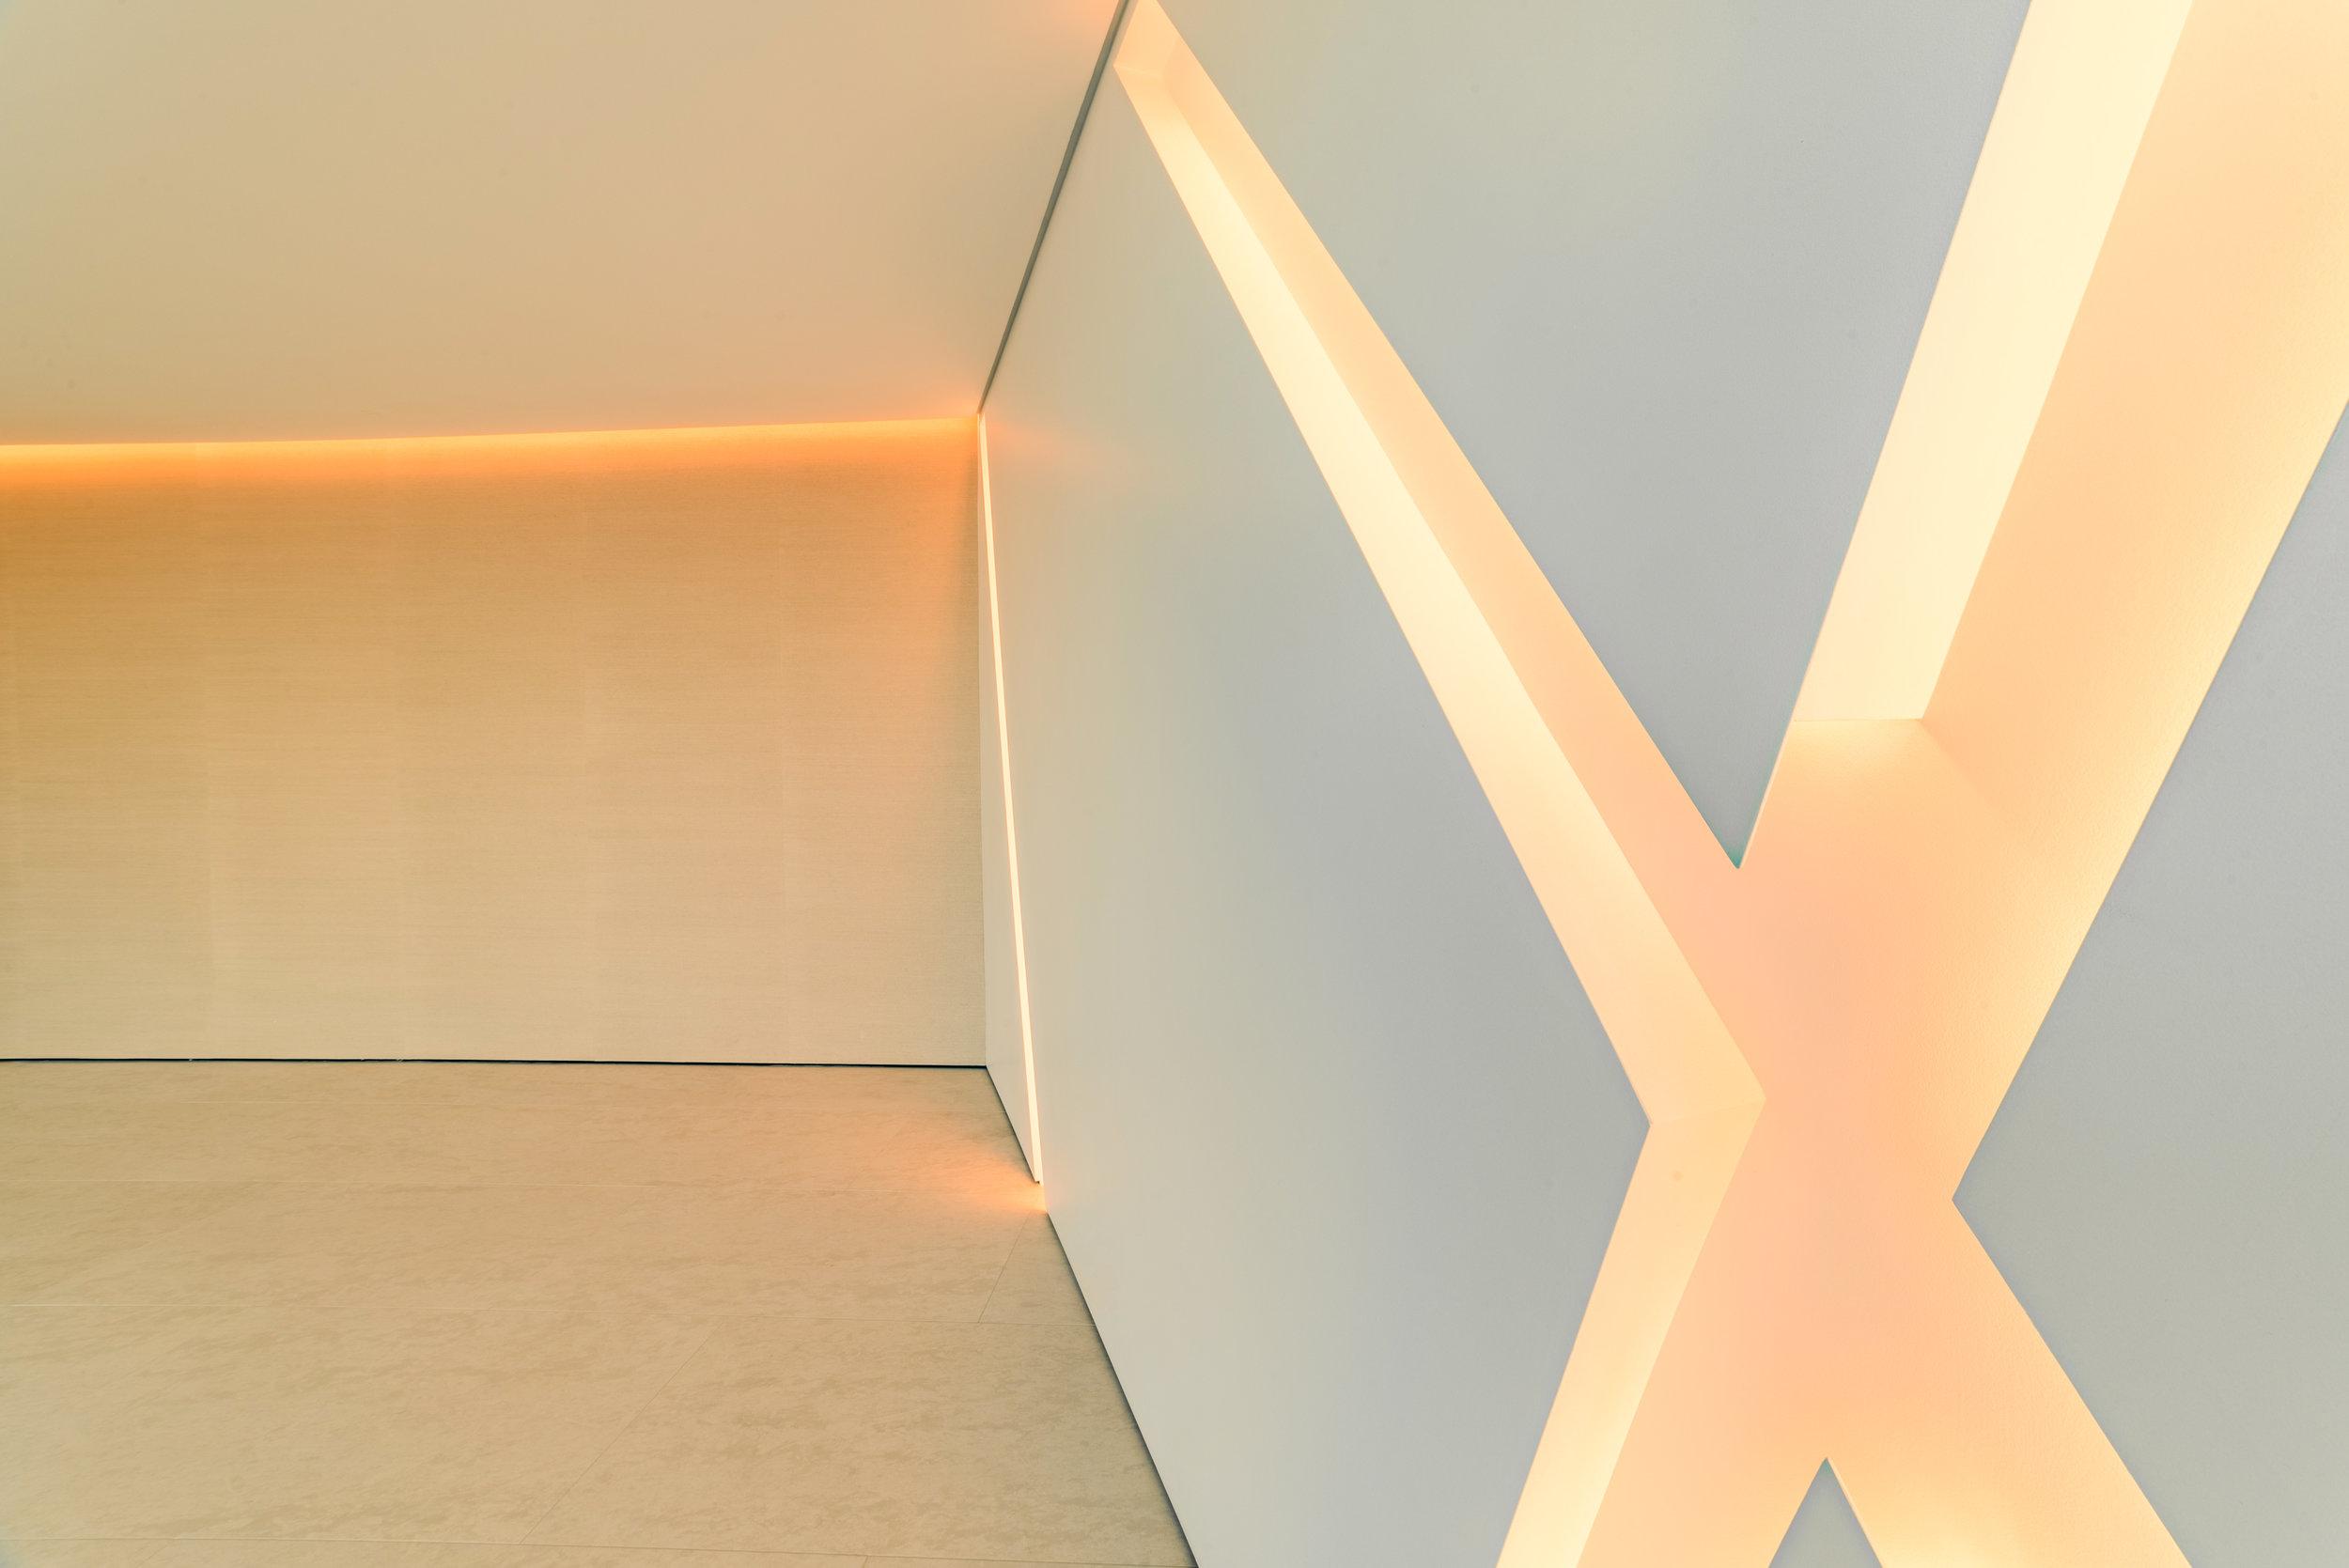 PES-lighting-installation-design-losangeles.jpg